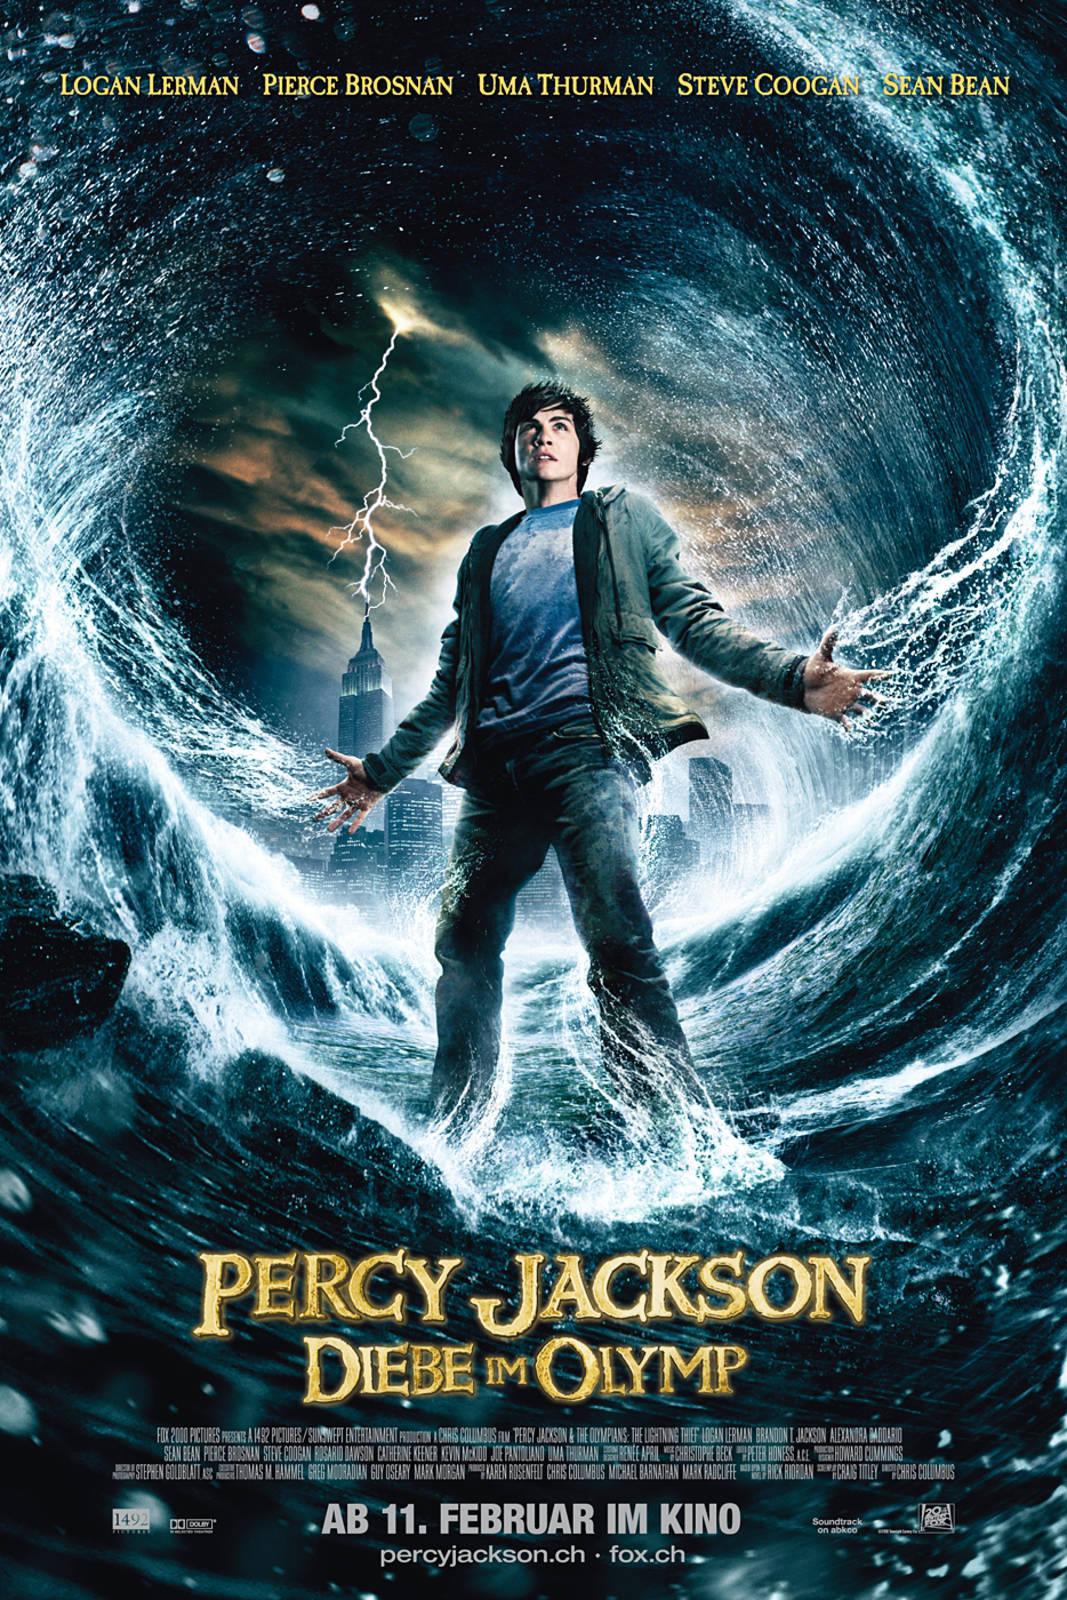 Percy Jackson Diebe Im Olymp Film Trailer Kritik Mediadeskslovakia Eu